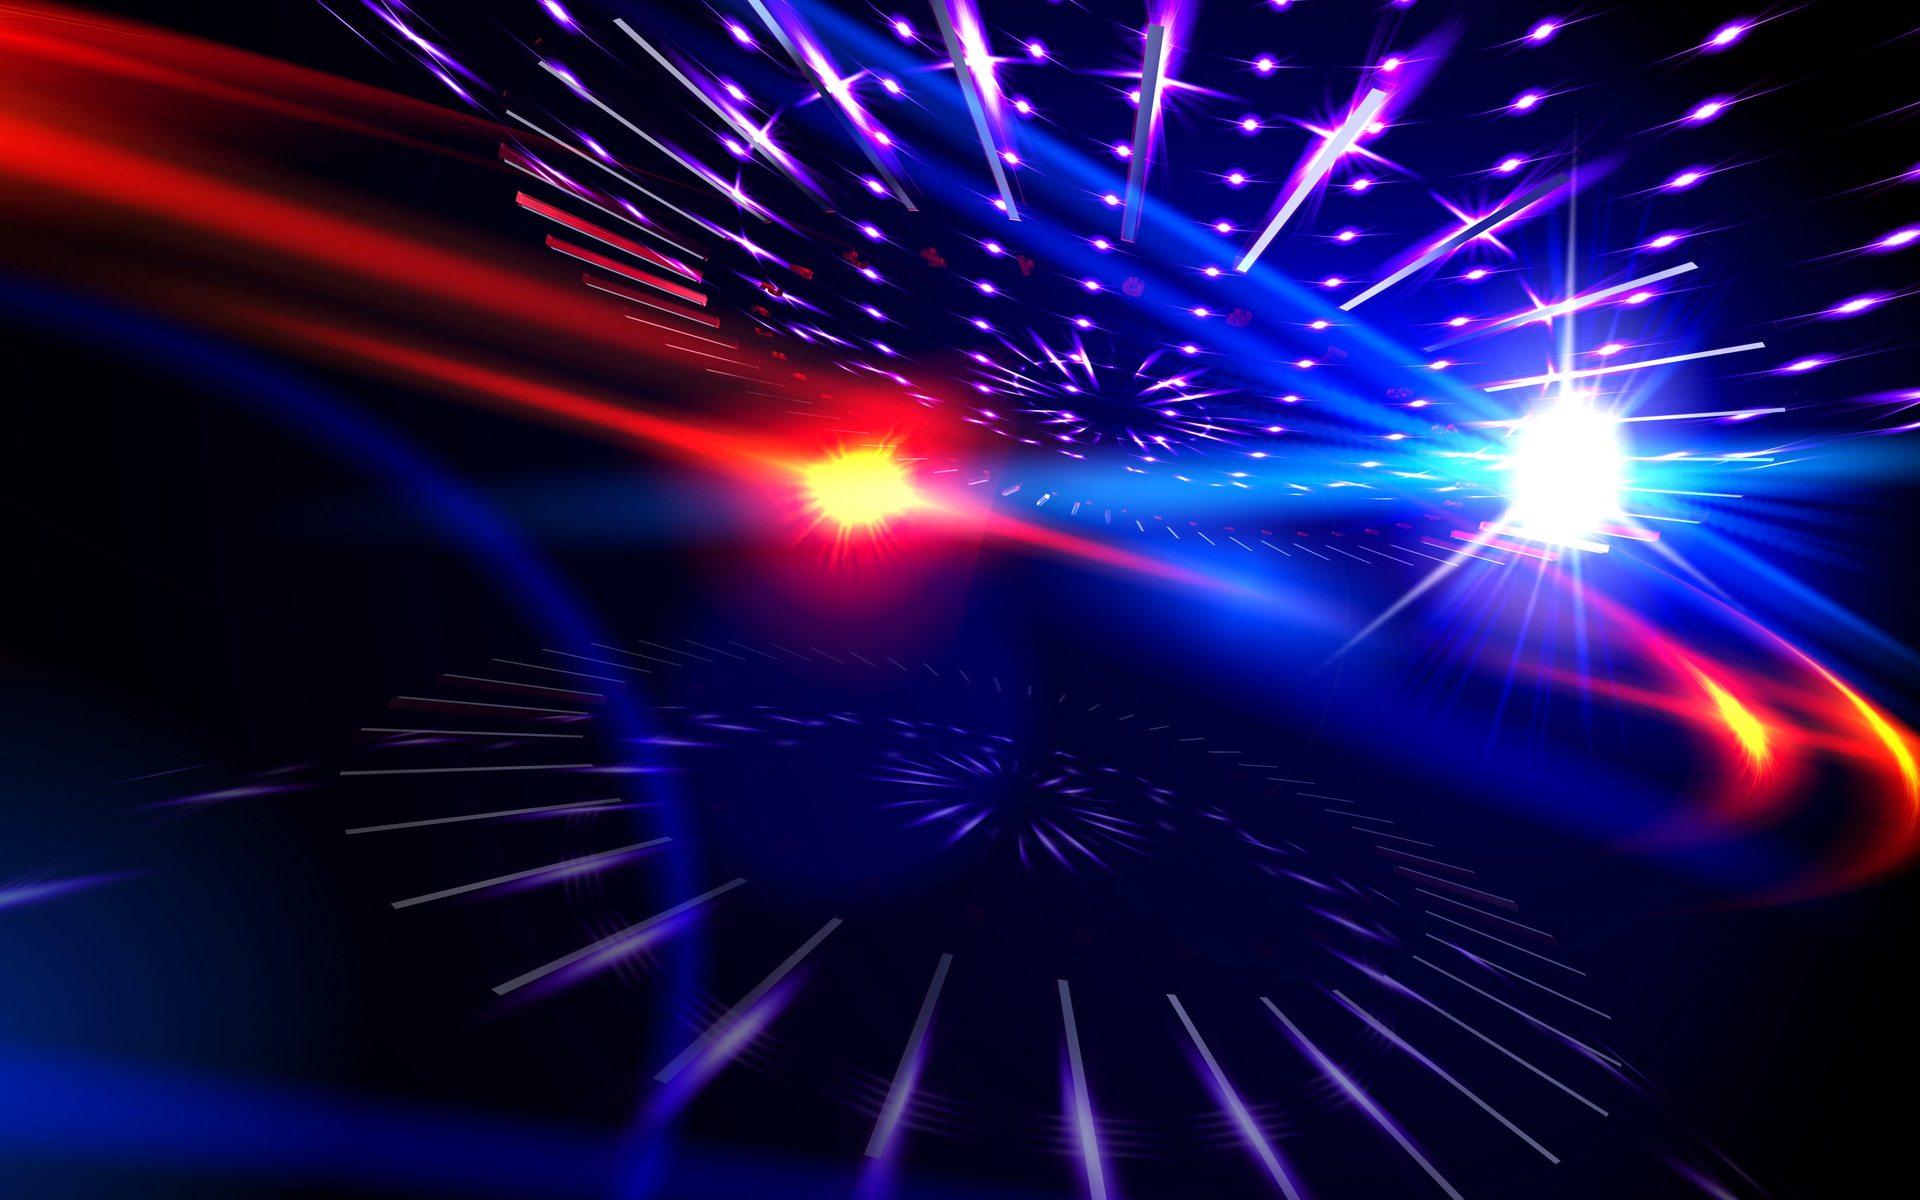 Disco lights wallpaper wallpapersafari - Club lights wallpaper ...